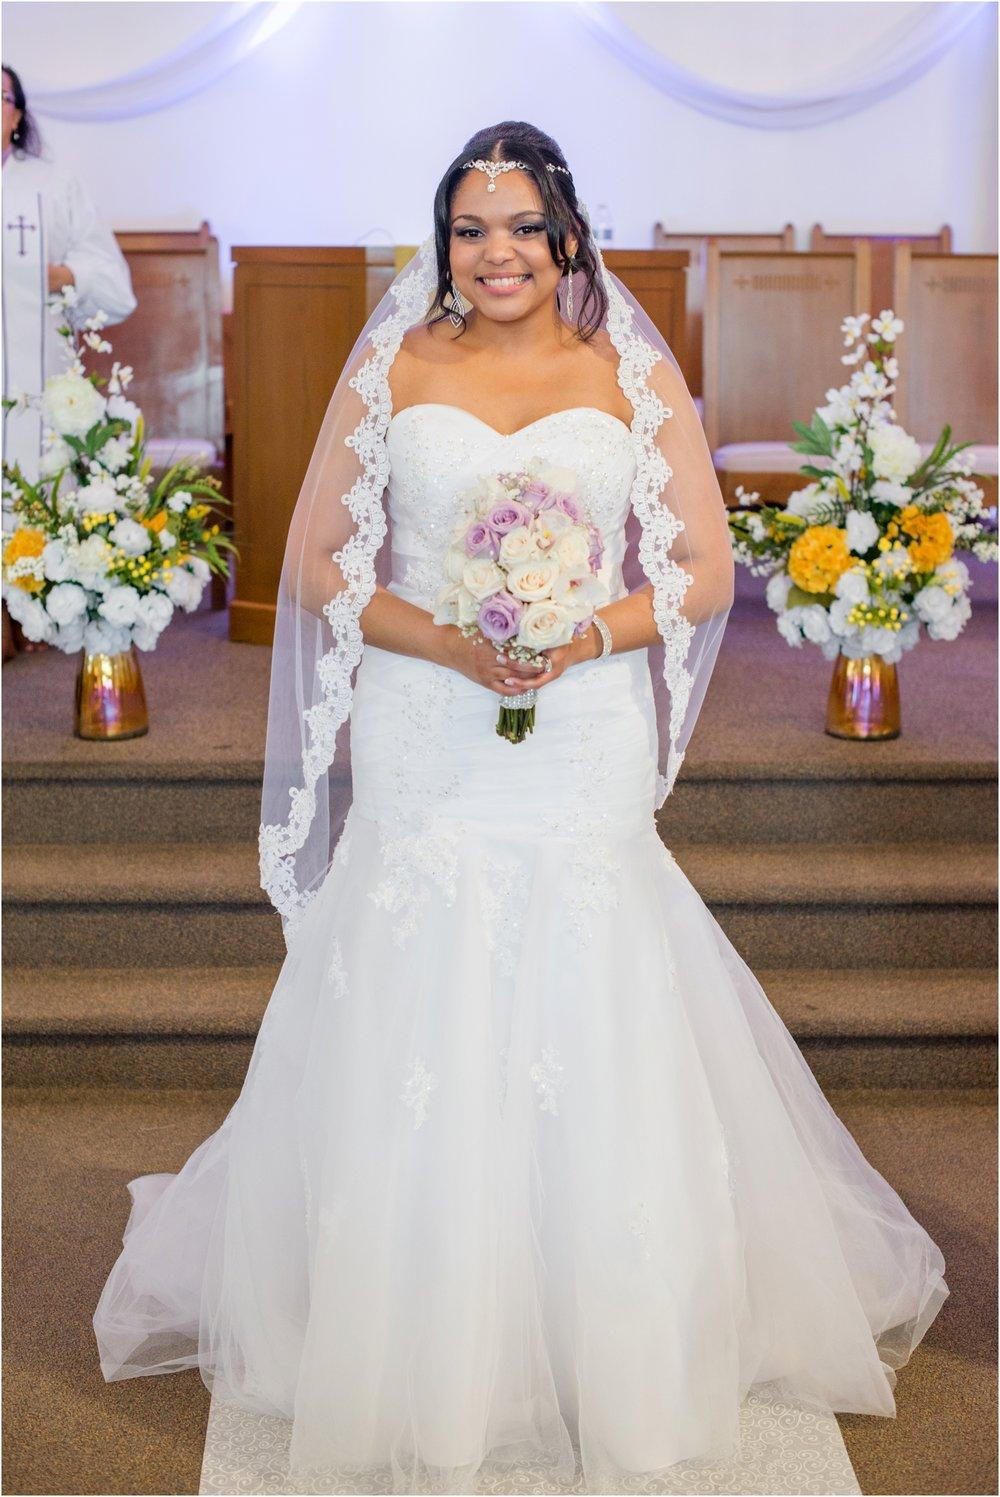 jaclyn-auletta-photography-blog-north-carolina-wedding-photographer-blogger_0036.jpg